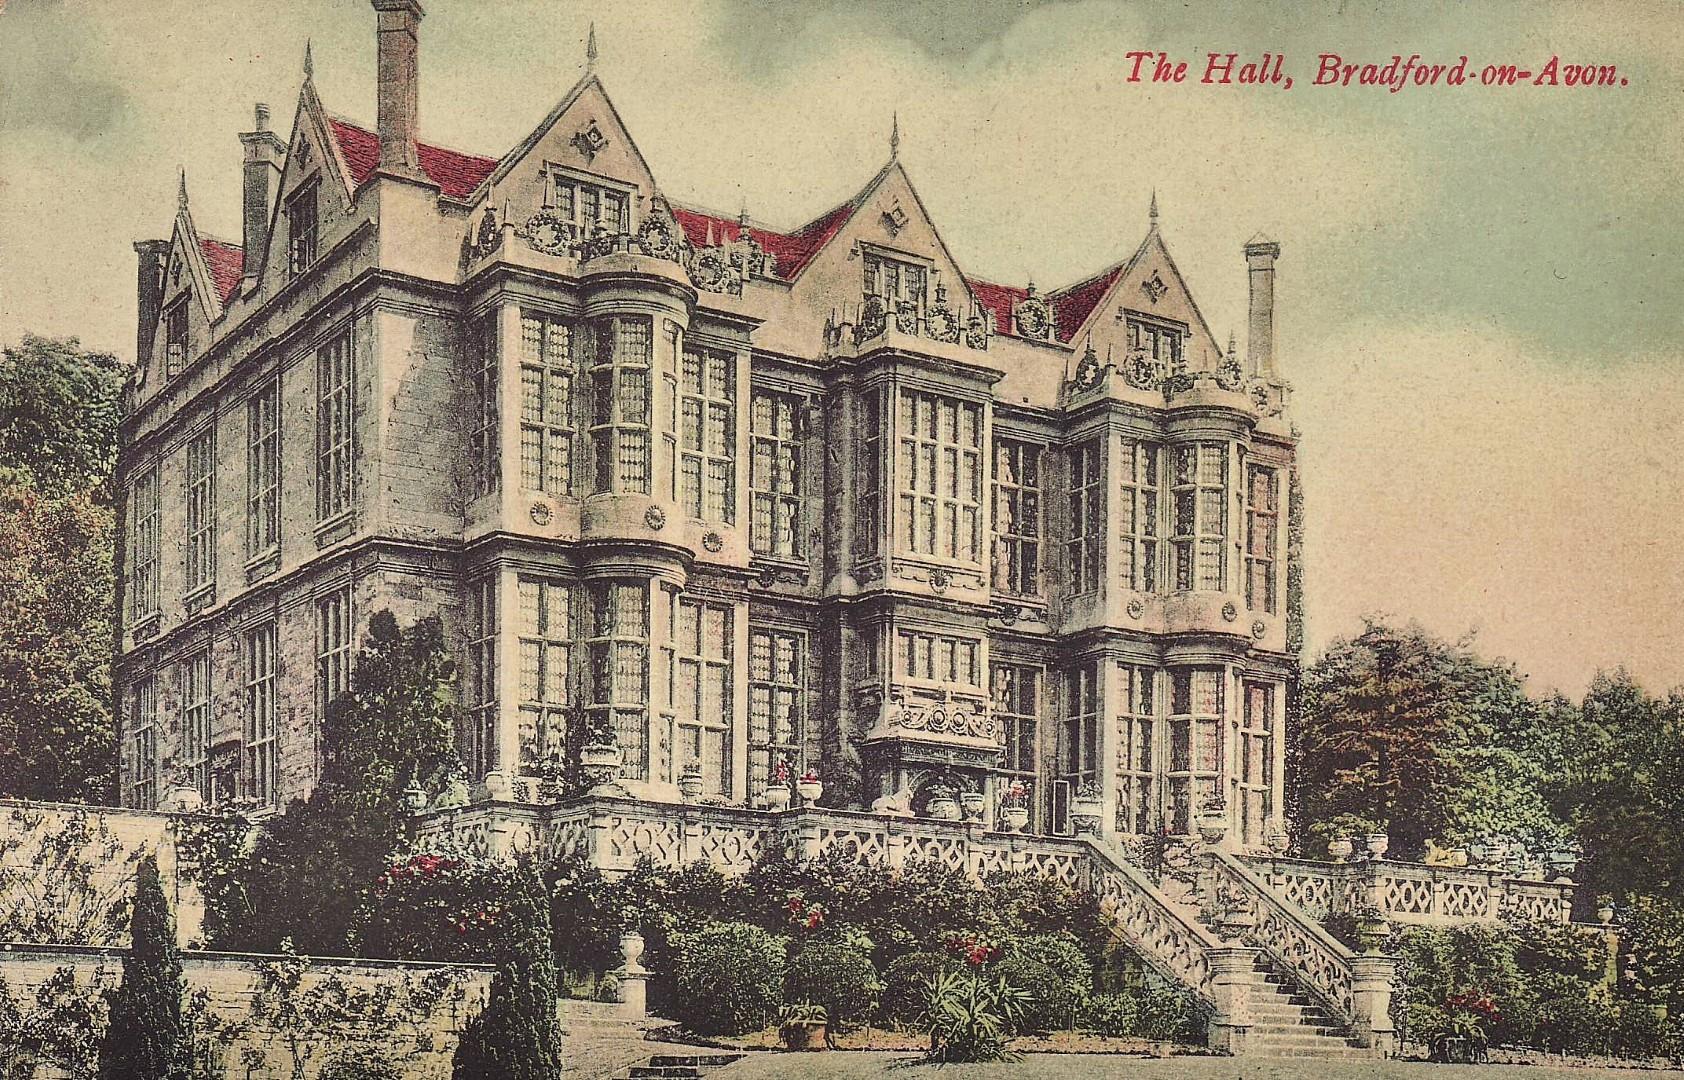 1. Bradford-on-Avon The Hall (Large).JPG